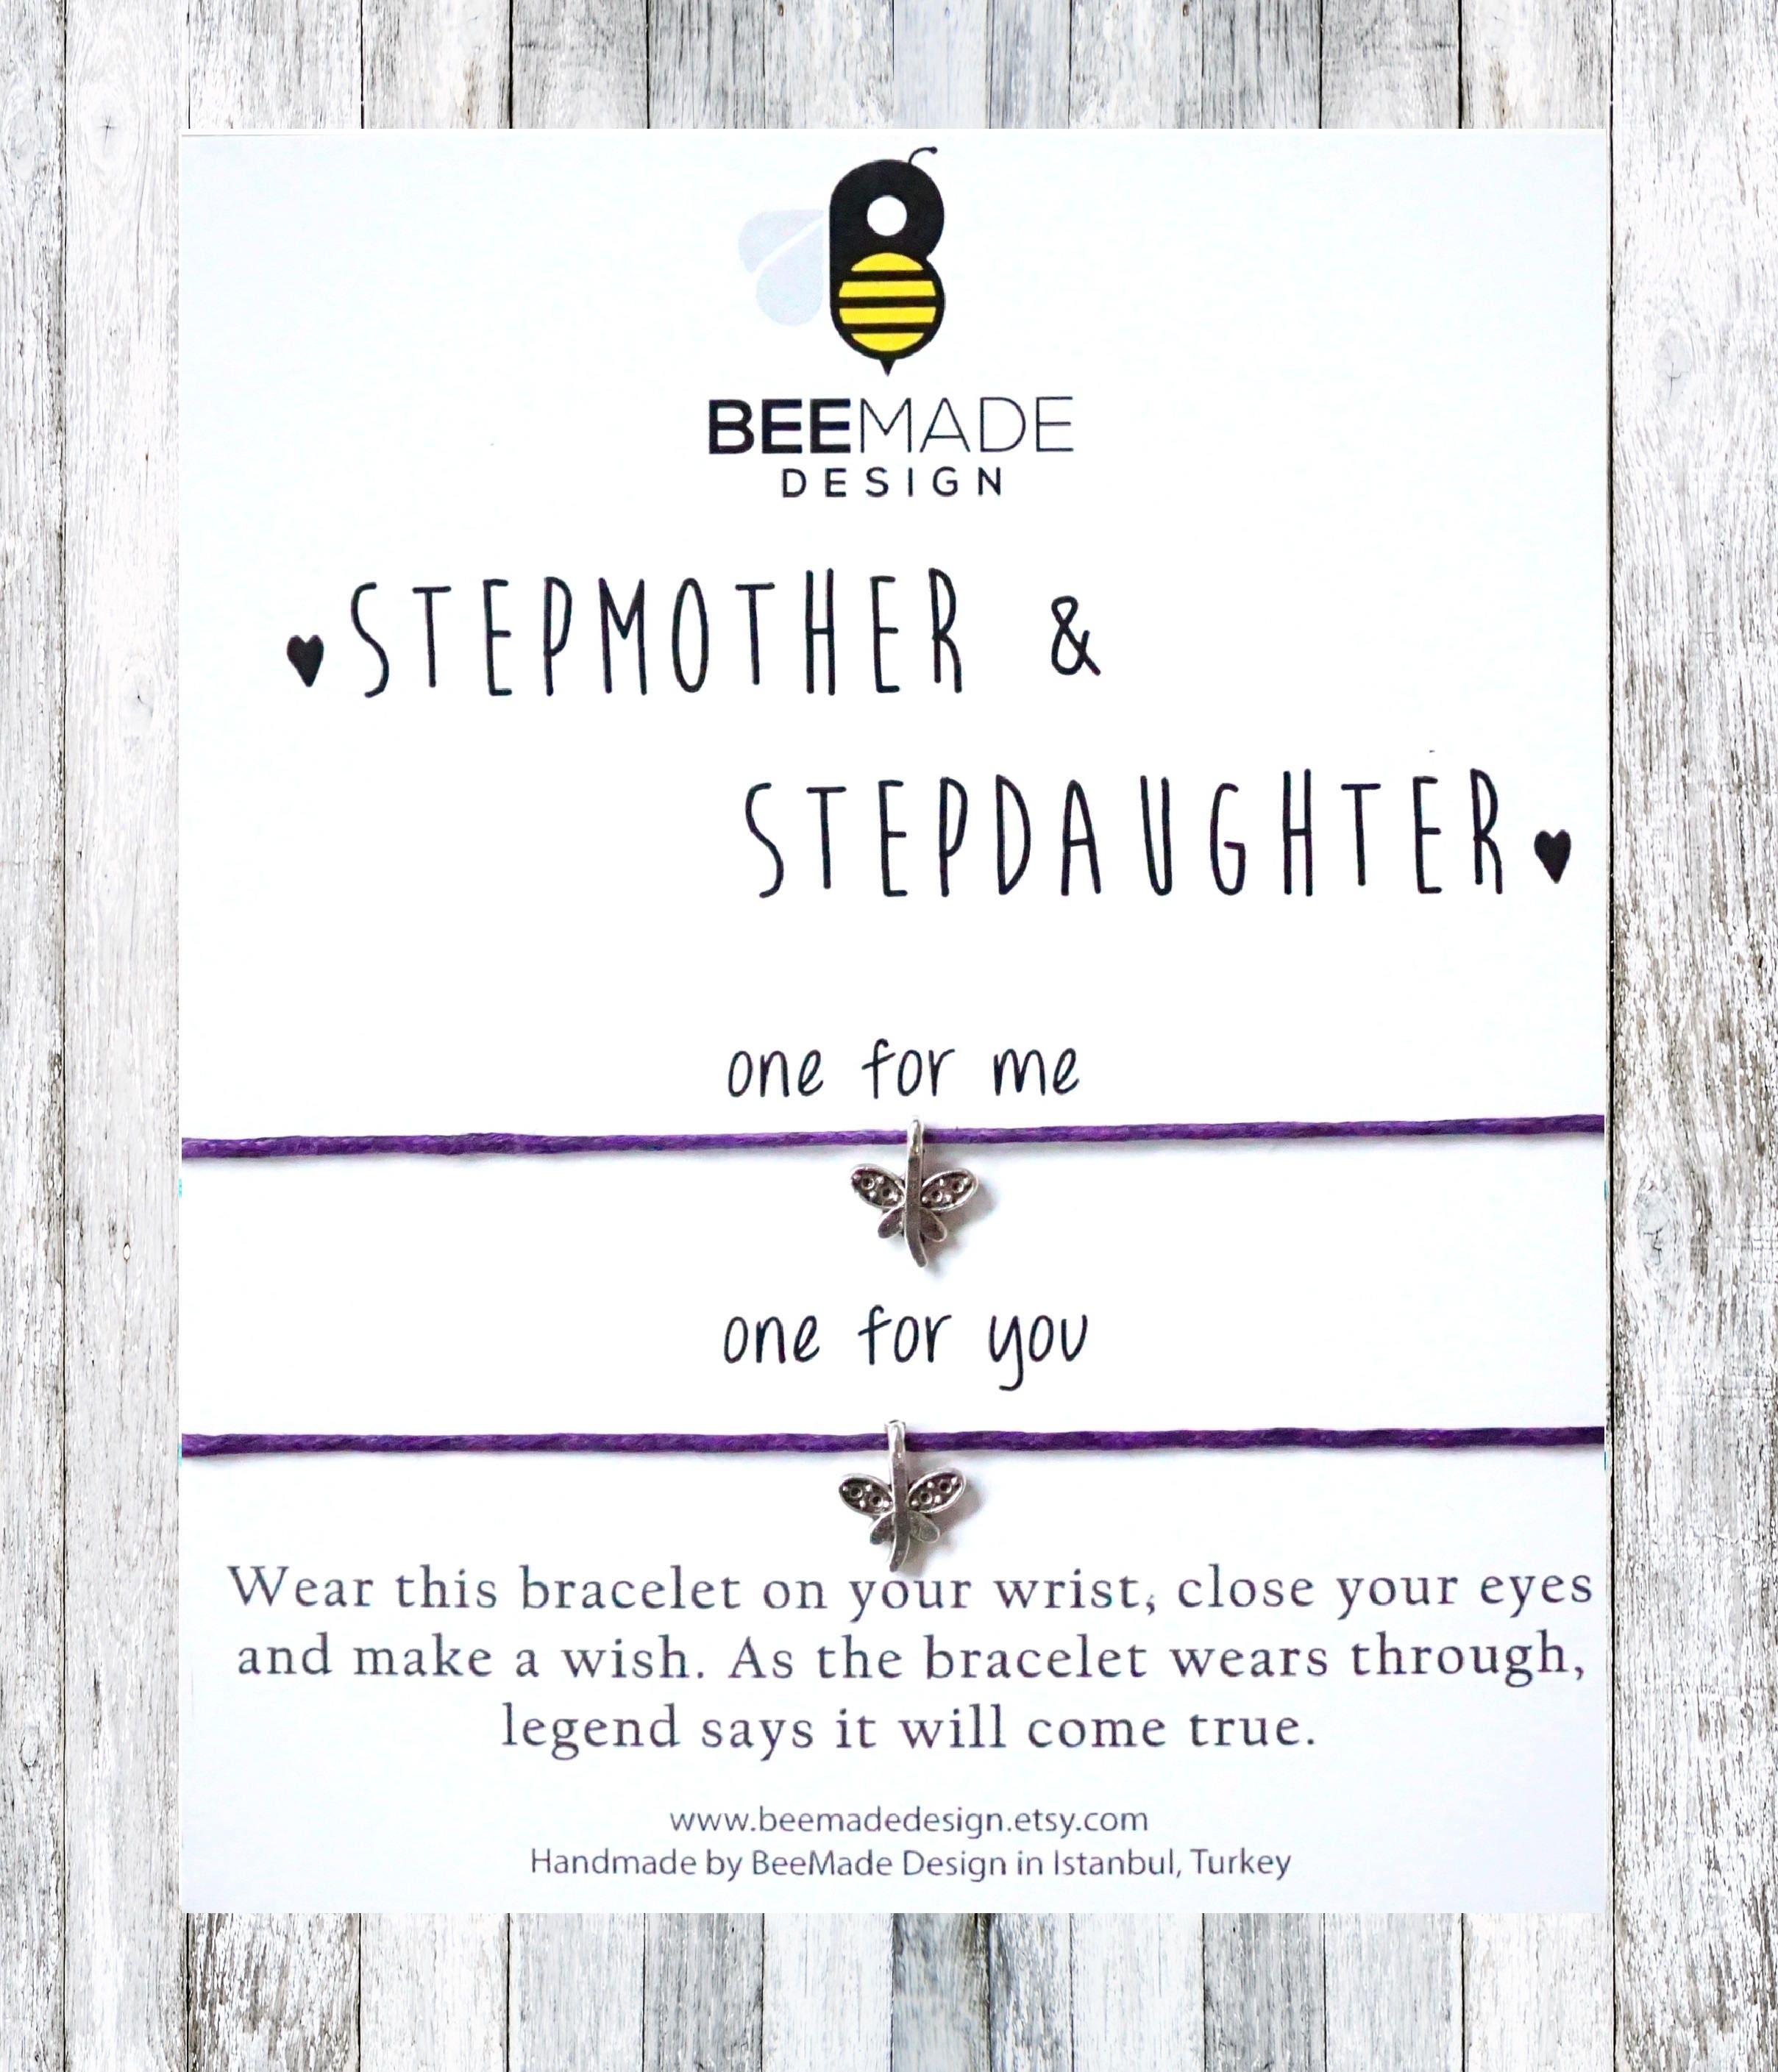 Schritt Mutter Schritt Tochter passende Armbänder für 2 | Etsy